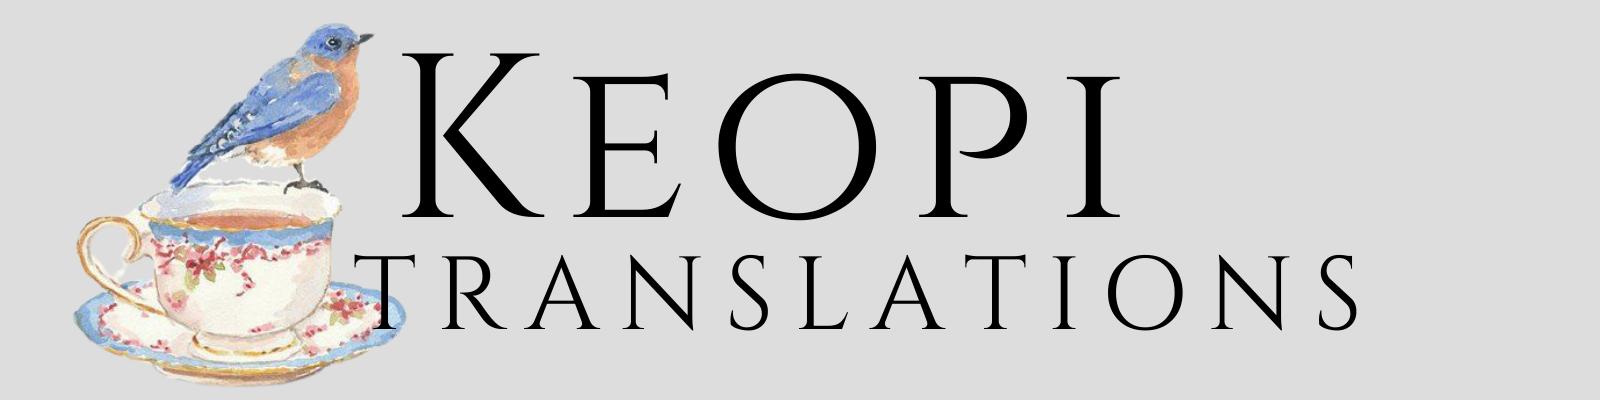 Keopi Translations